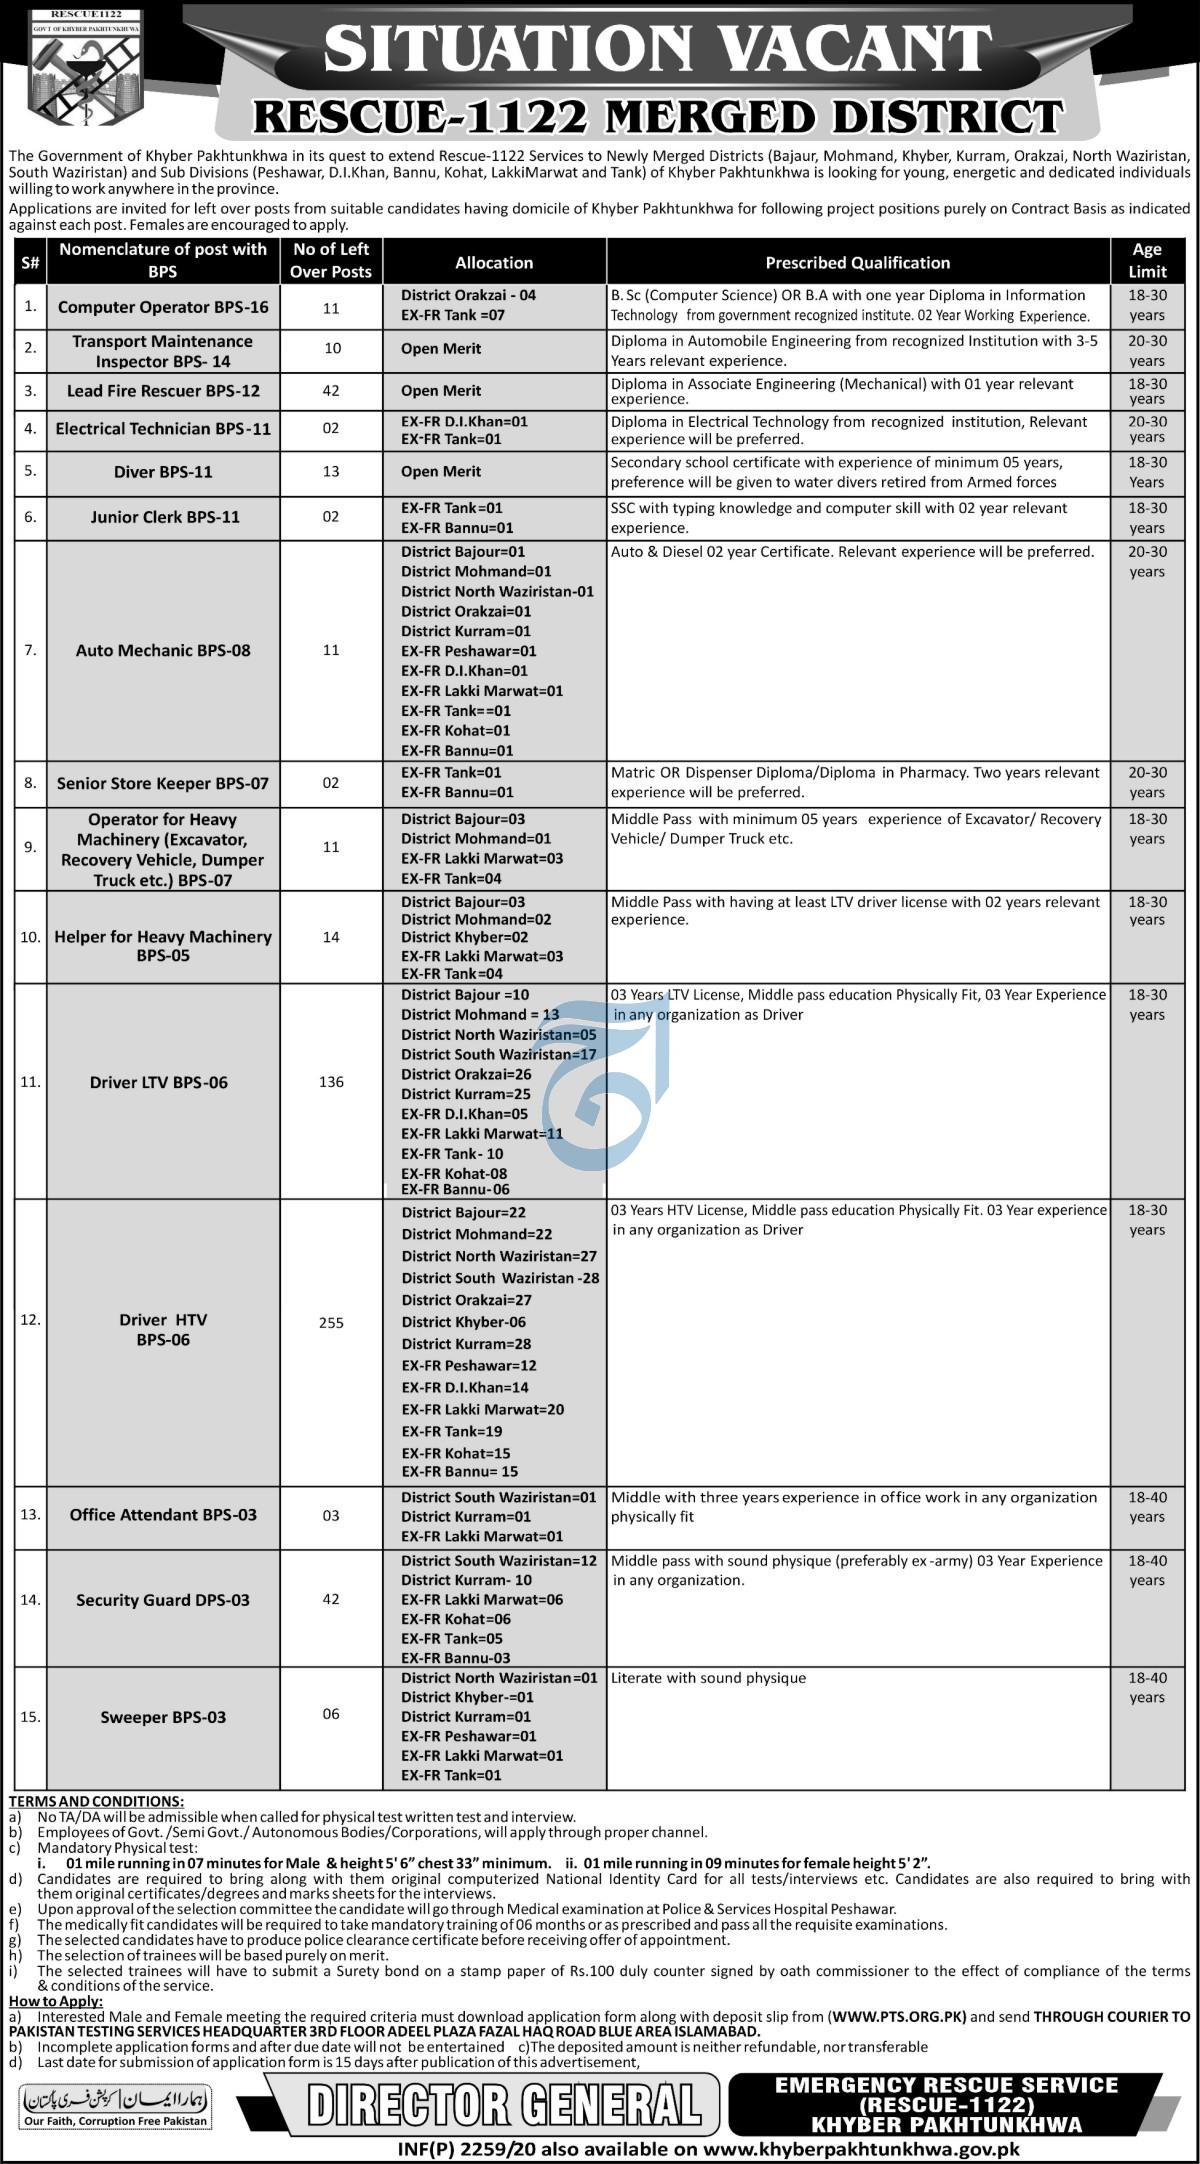 Kpk Emergency Rescue Service 1122 jobs newspaper ad for Transport Maintenance Inspector in Peshawar